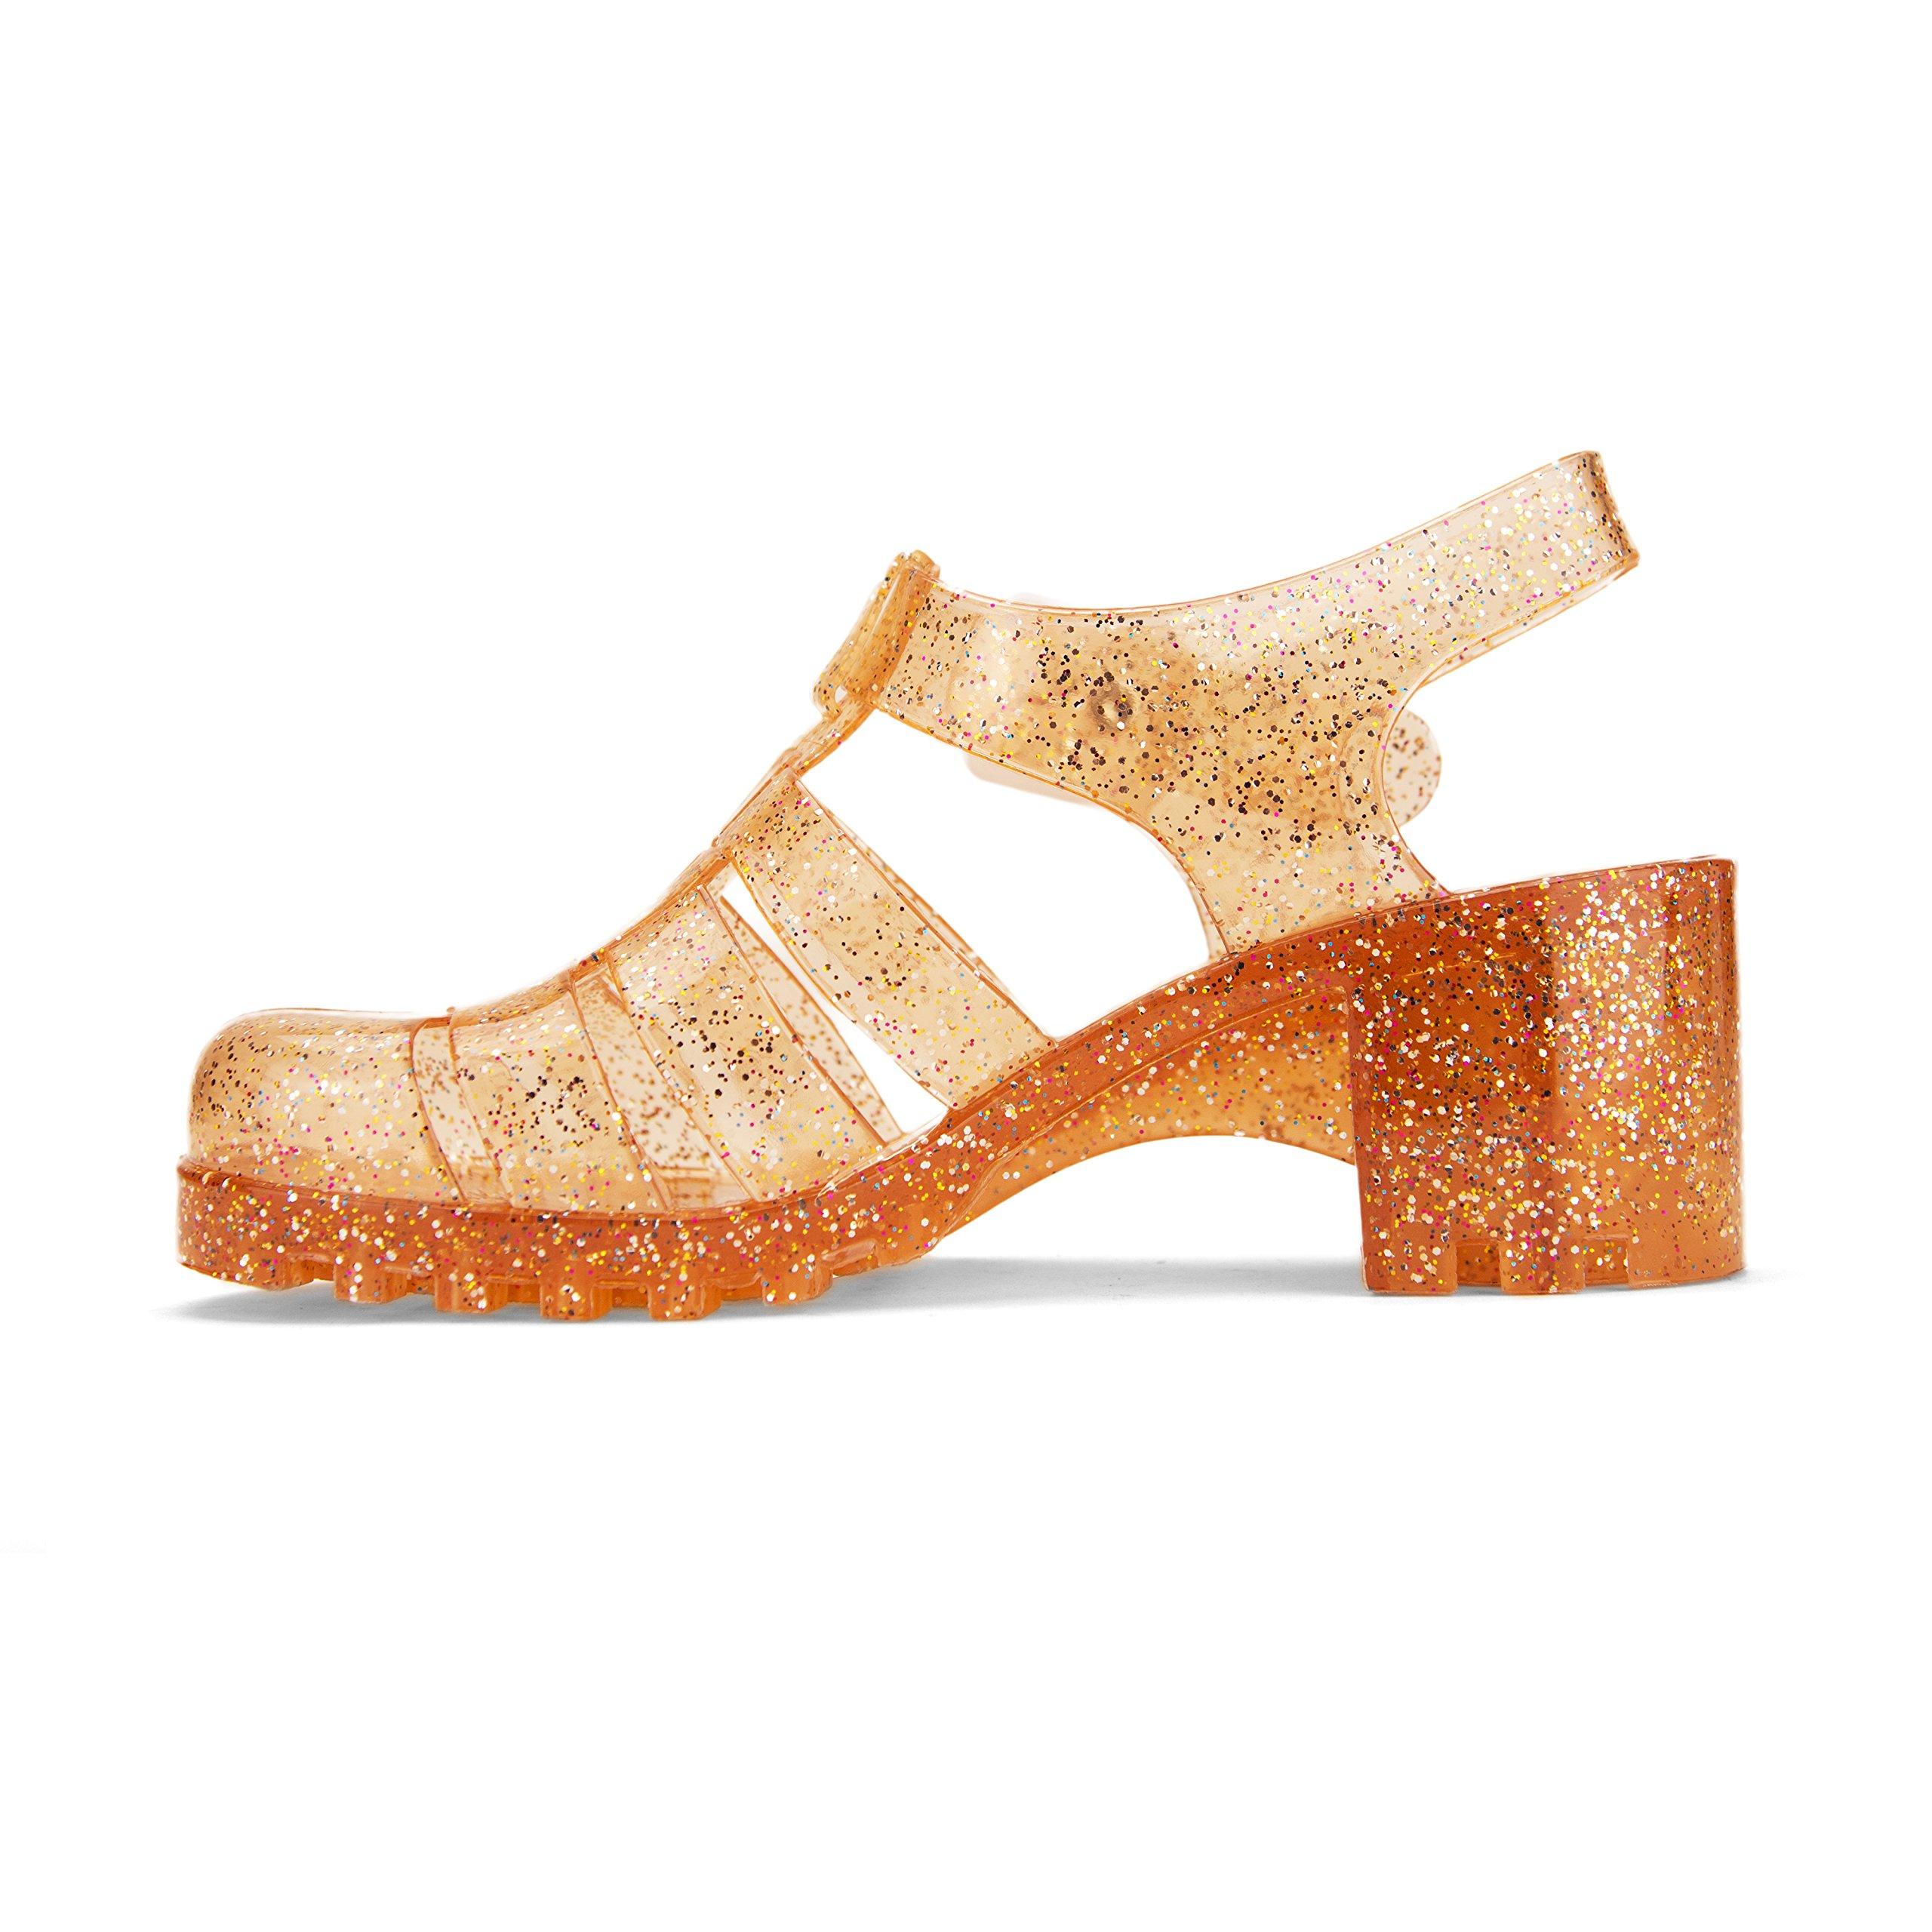 Chemistry Women's April Jelly Platform Wedge Heel Sandals Adjustable Strap Upper Low Top Shoes (5 B(M) US, Orange)